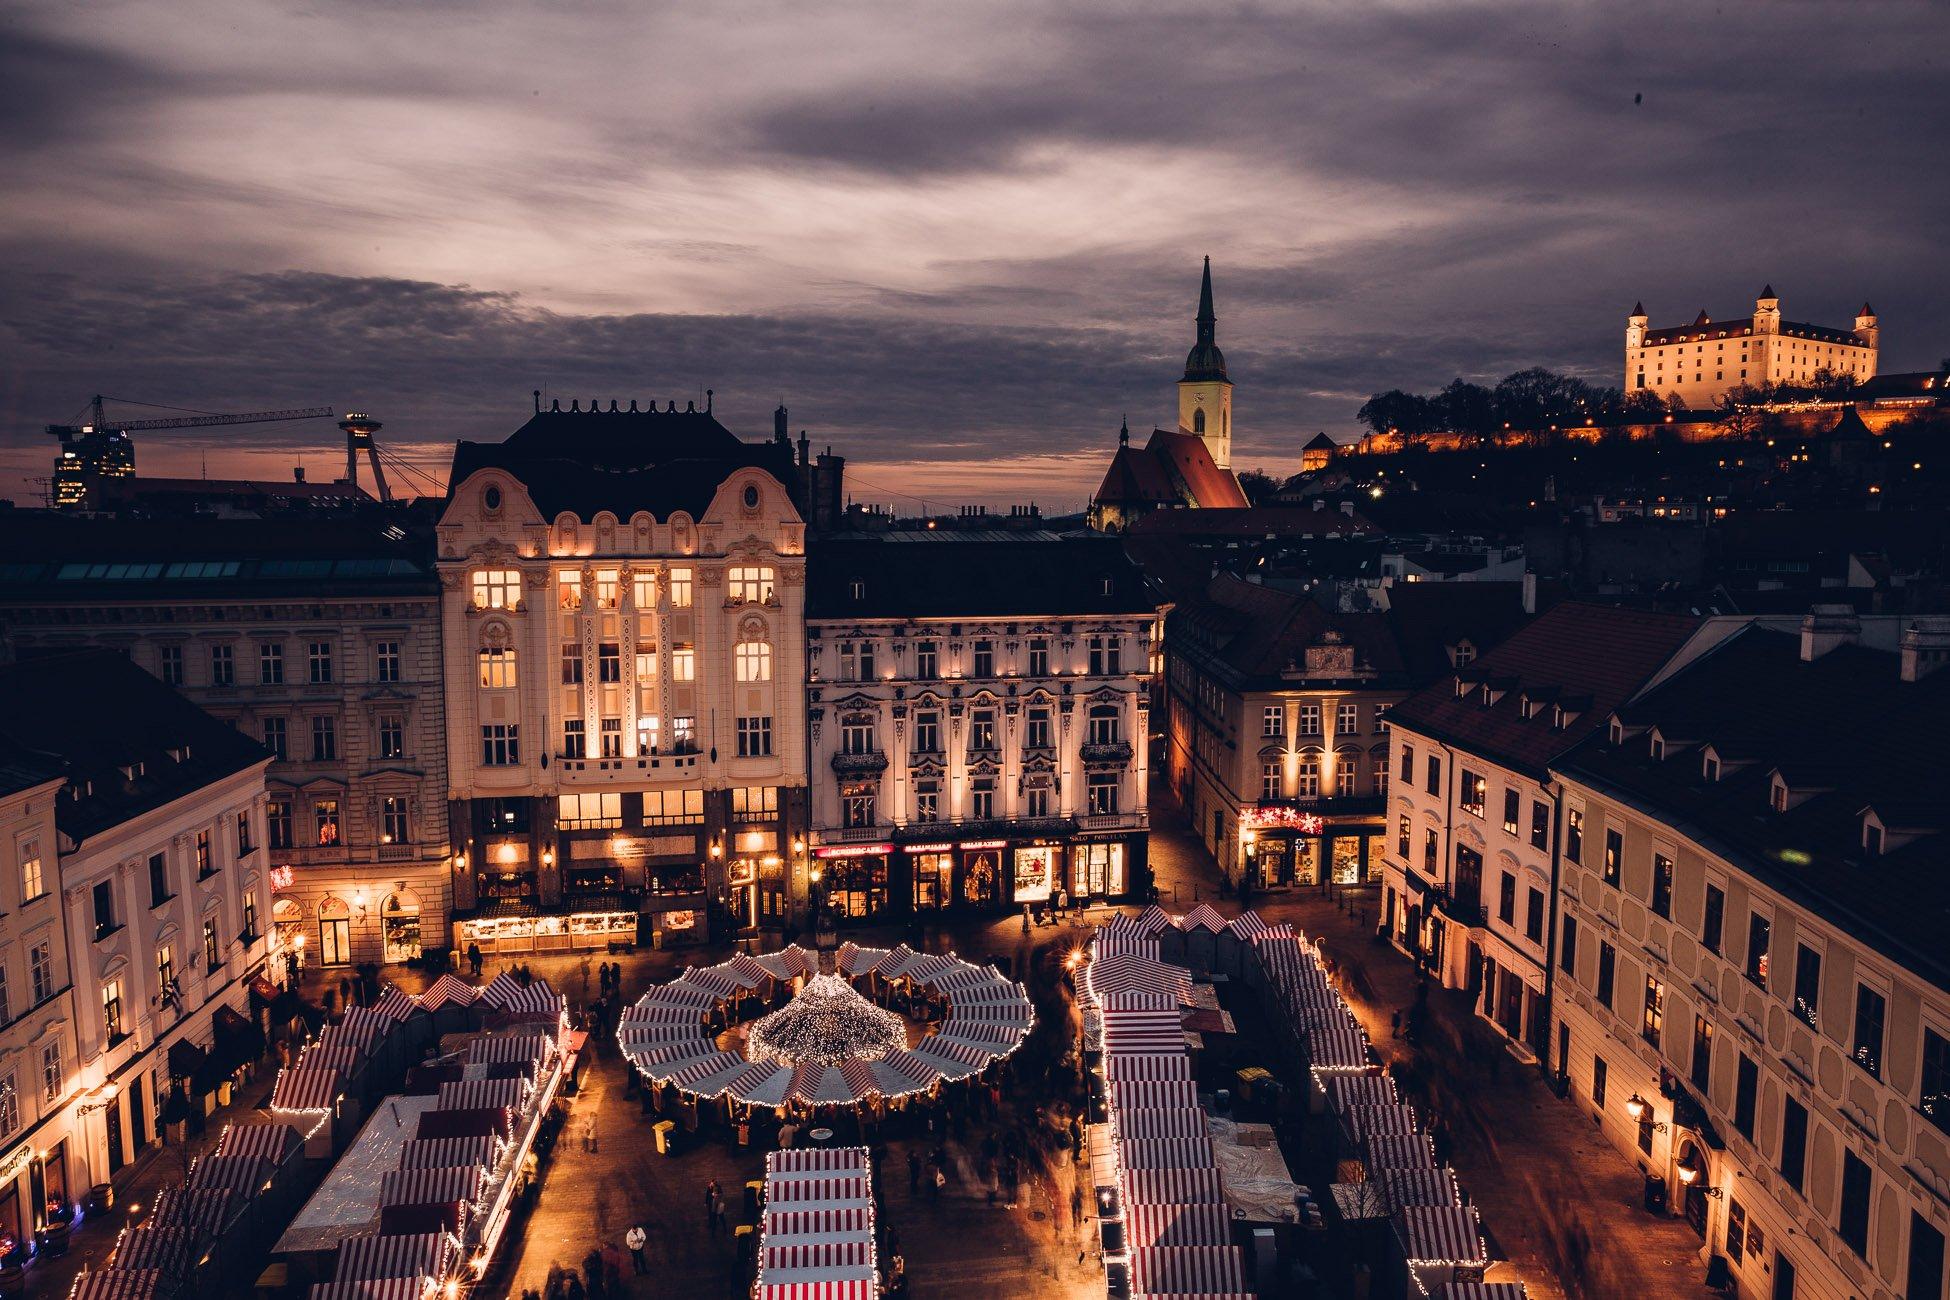 24 hours Bratislava in winter - Christmas market at the Main Square Hlavné námestie in Bratislava